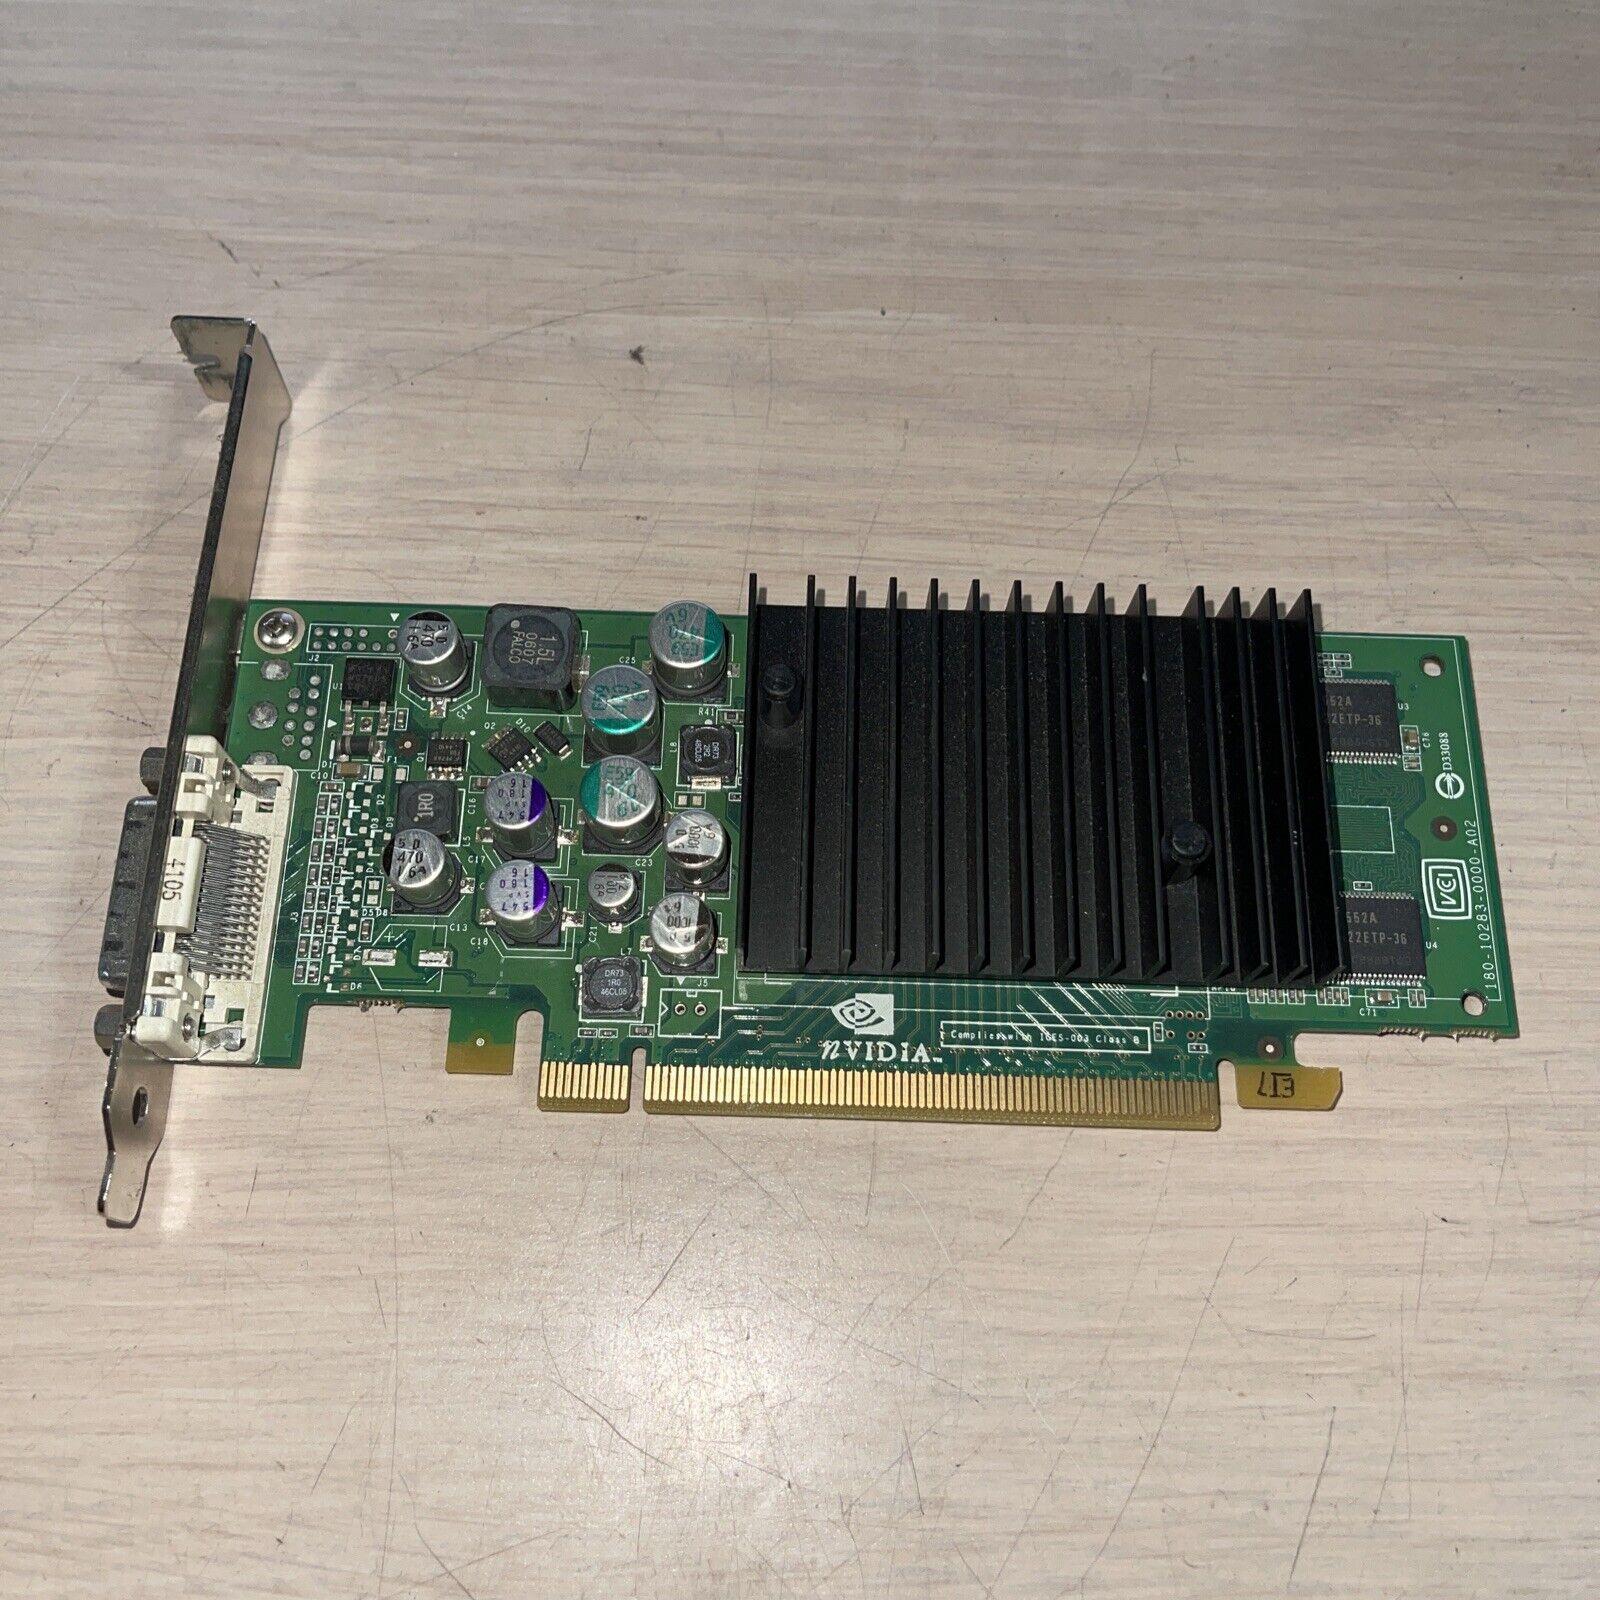 Lot of 7 HP Quadro NVS 285 128MB DMS-59 Video Graphics Card 398685-001 396683-00